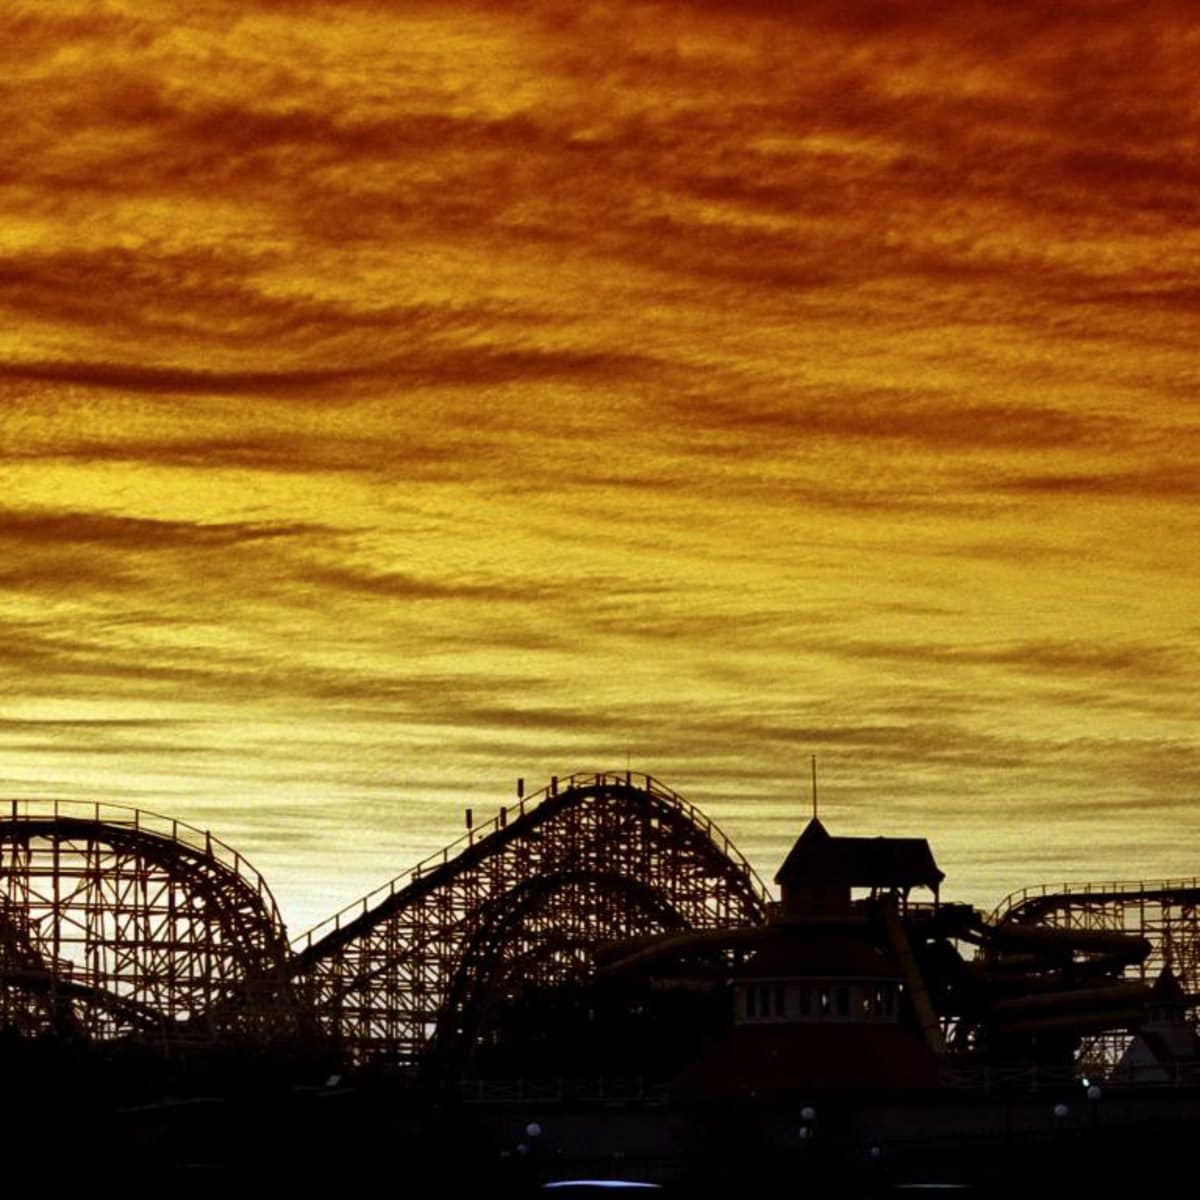 News_Astroworld_sunset